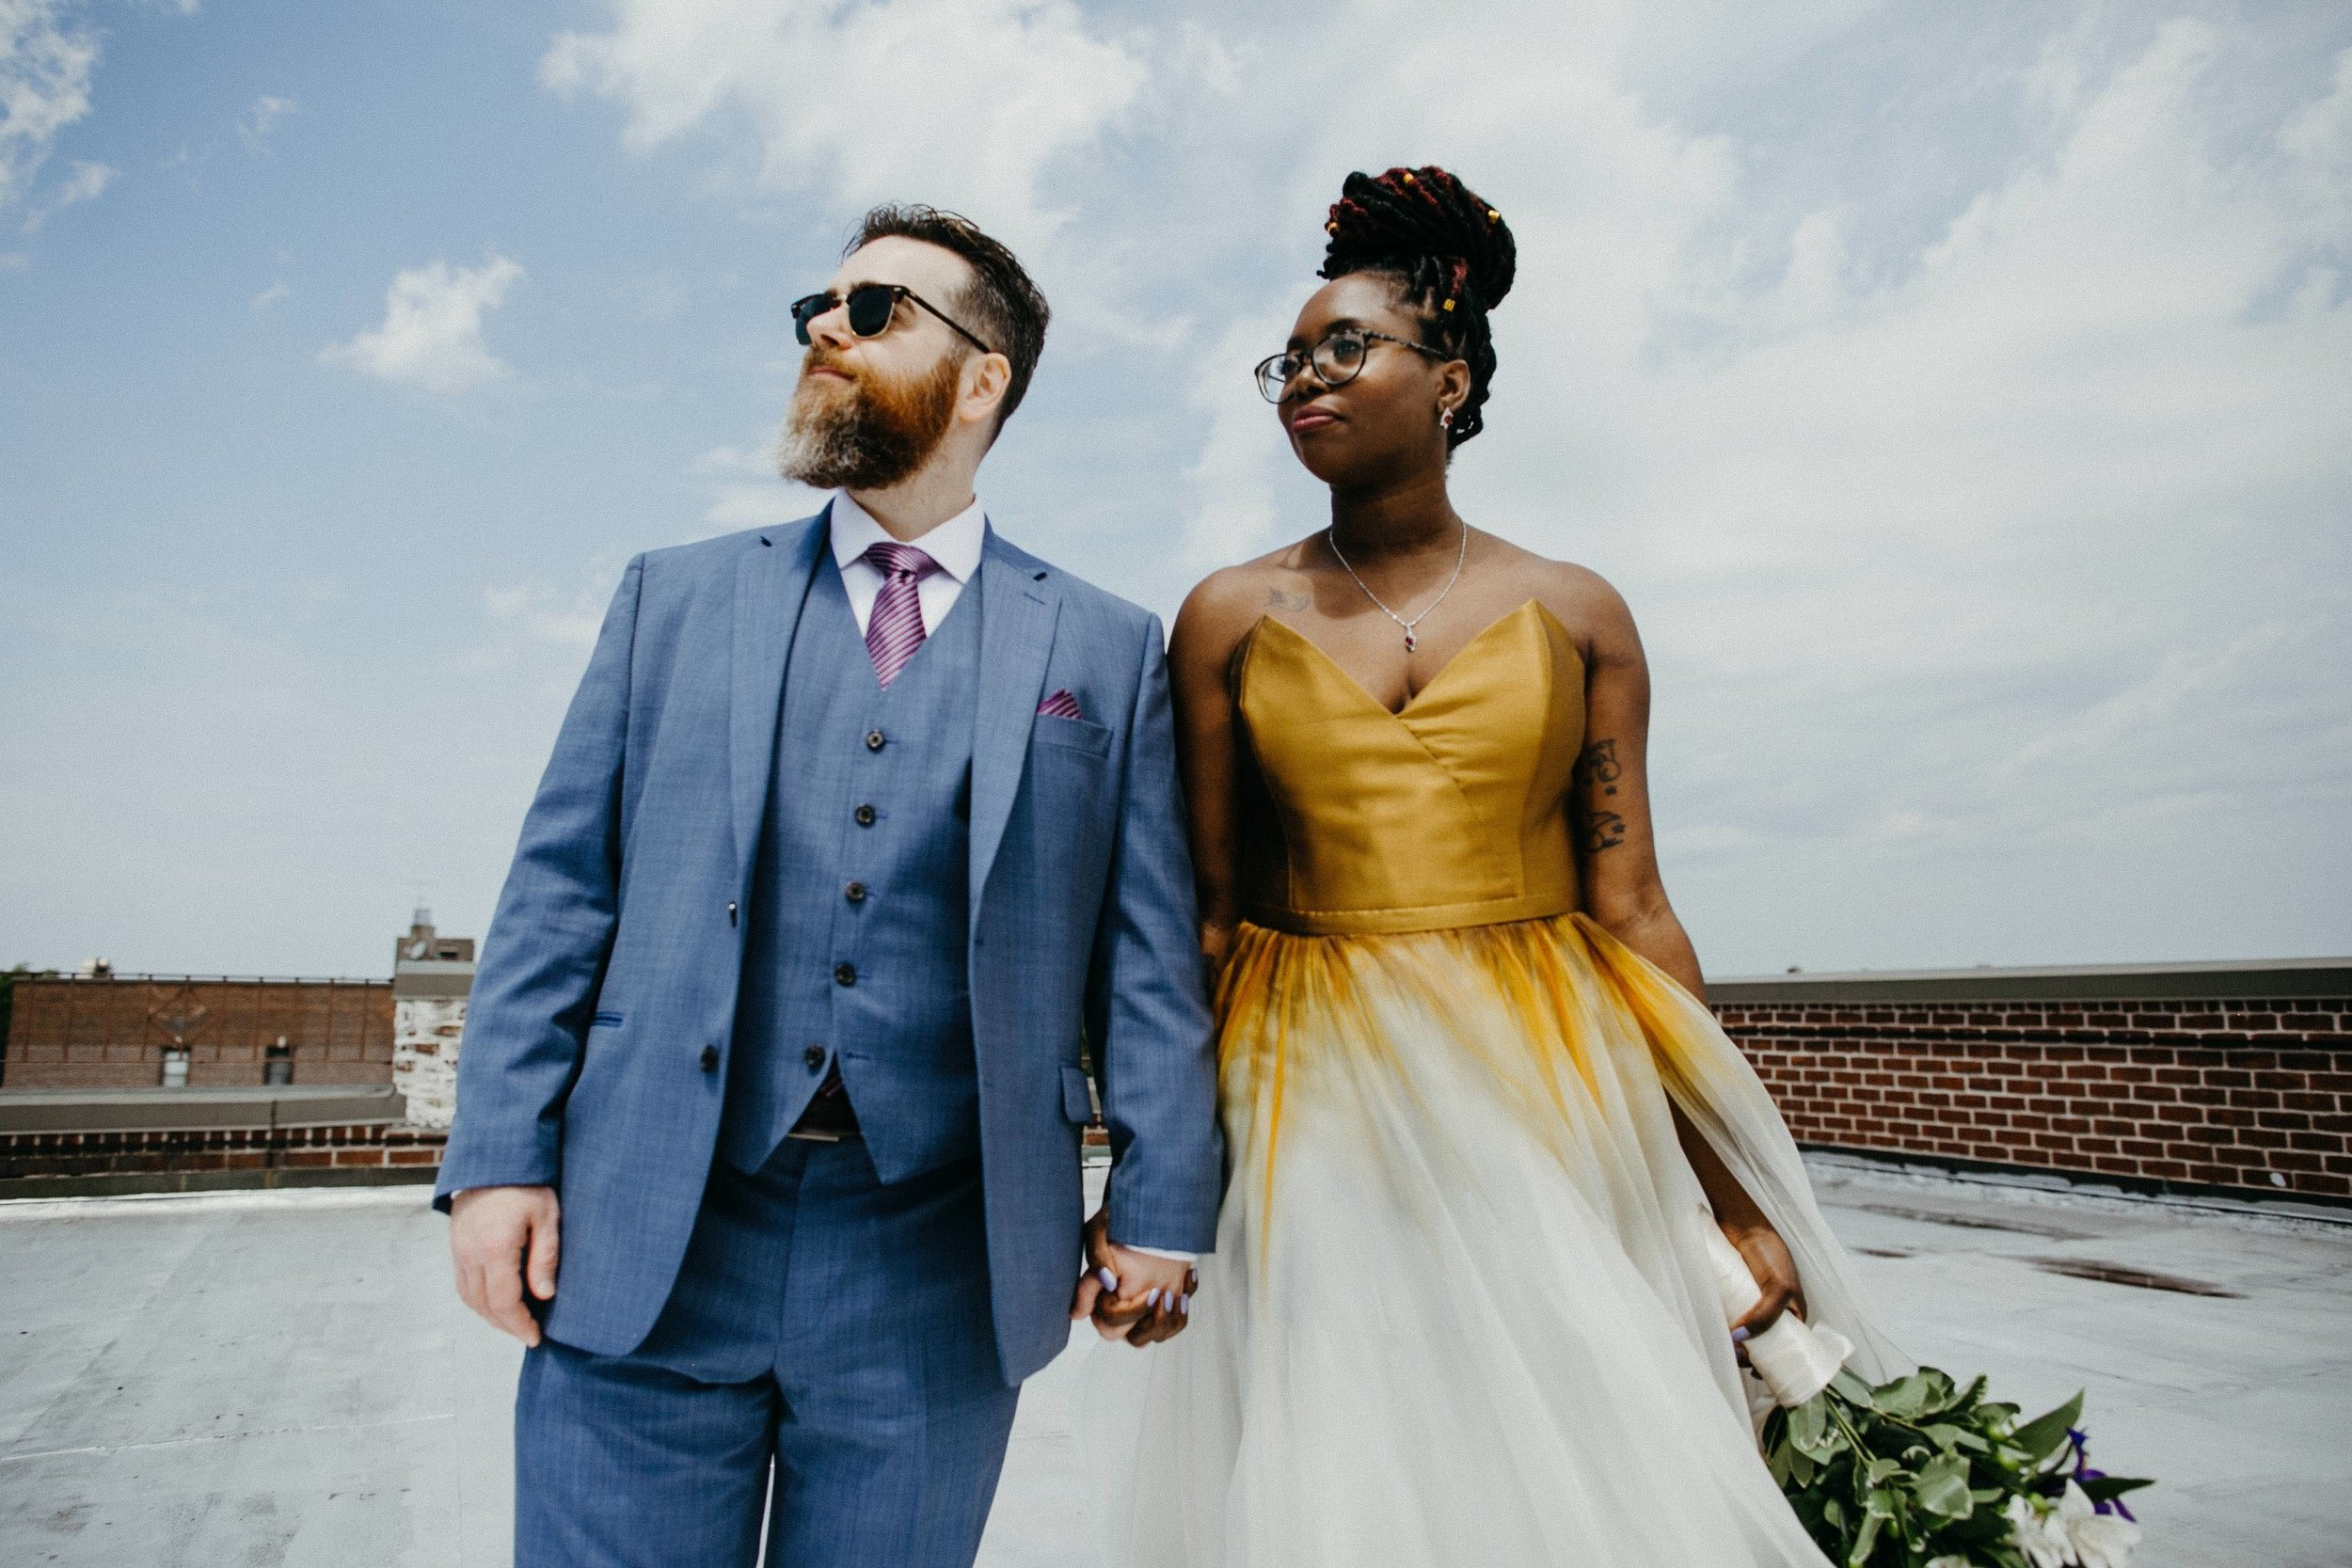 Sevlynn-Photography-Wedding-LIC-Landing-Maiella-NYC-15.jpg